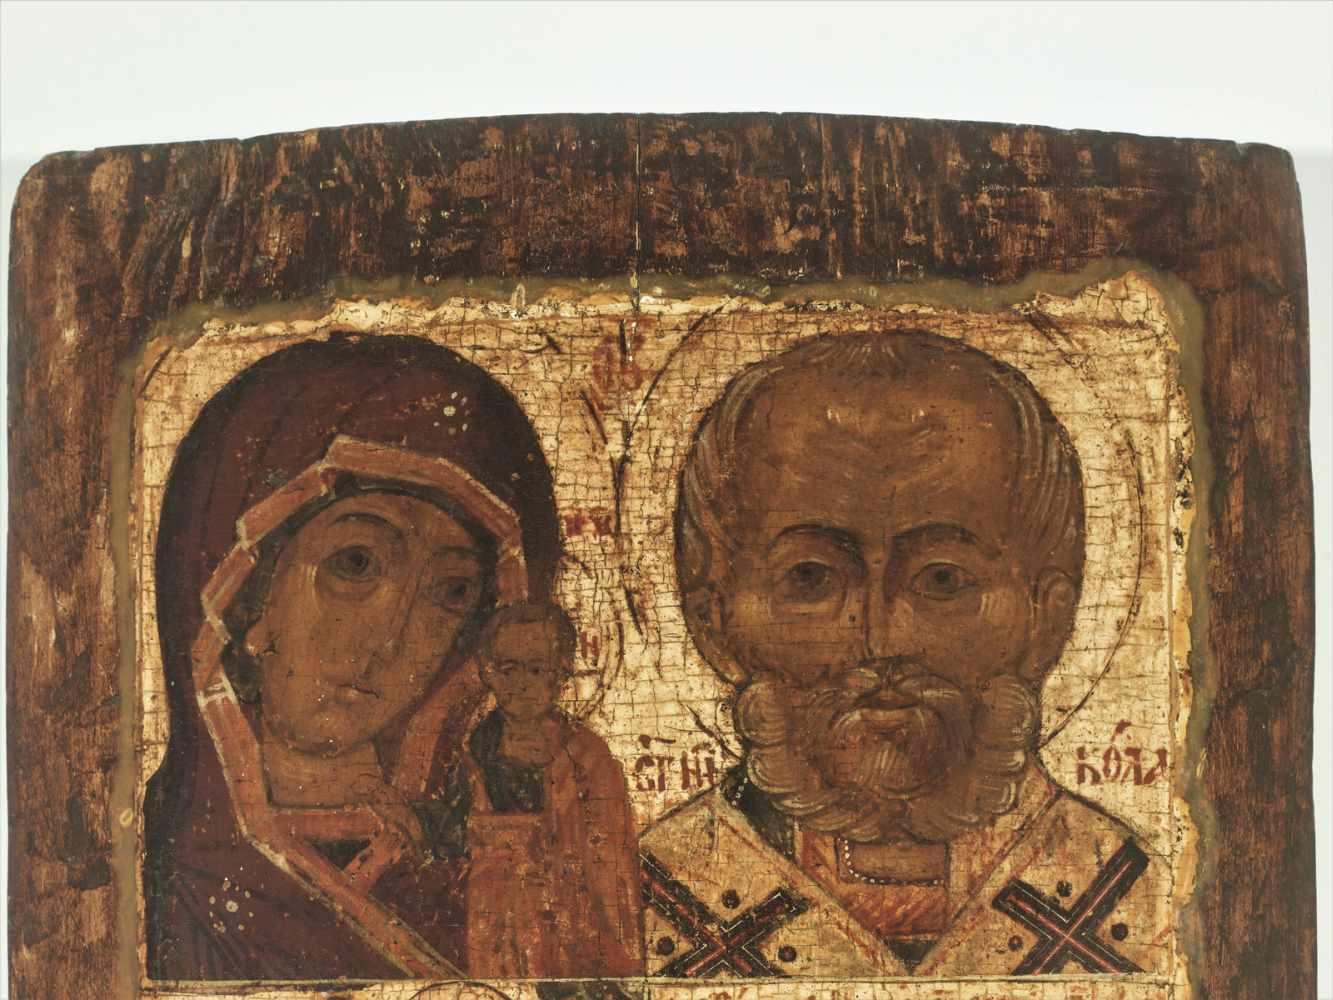 QUADRIPARTITE ICON WITH MARY AND JESUS, SAINTS NICOLAS AND GEORGE, 19th CENTURYWood, polychrome - Image 2 of 4